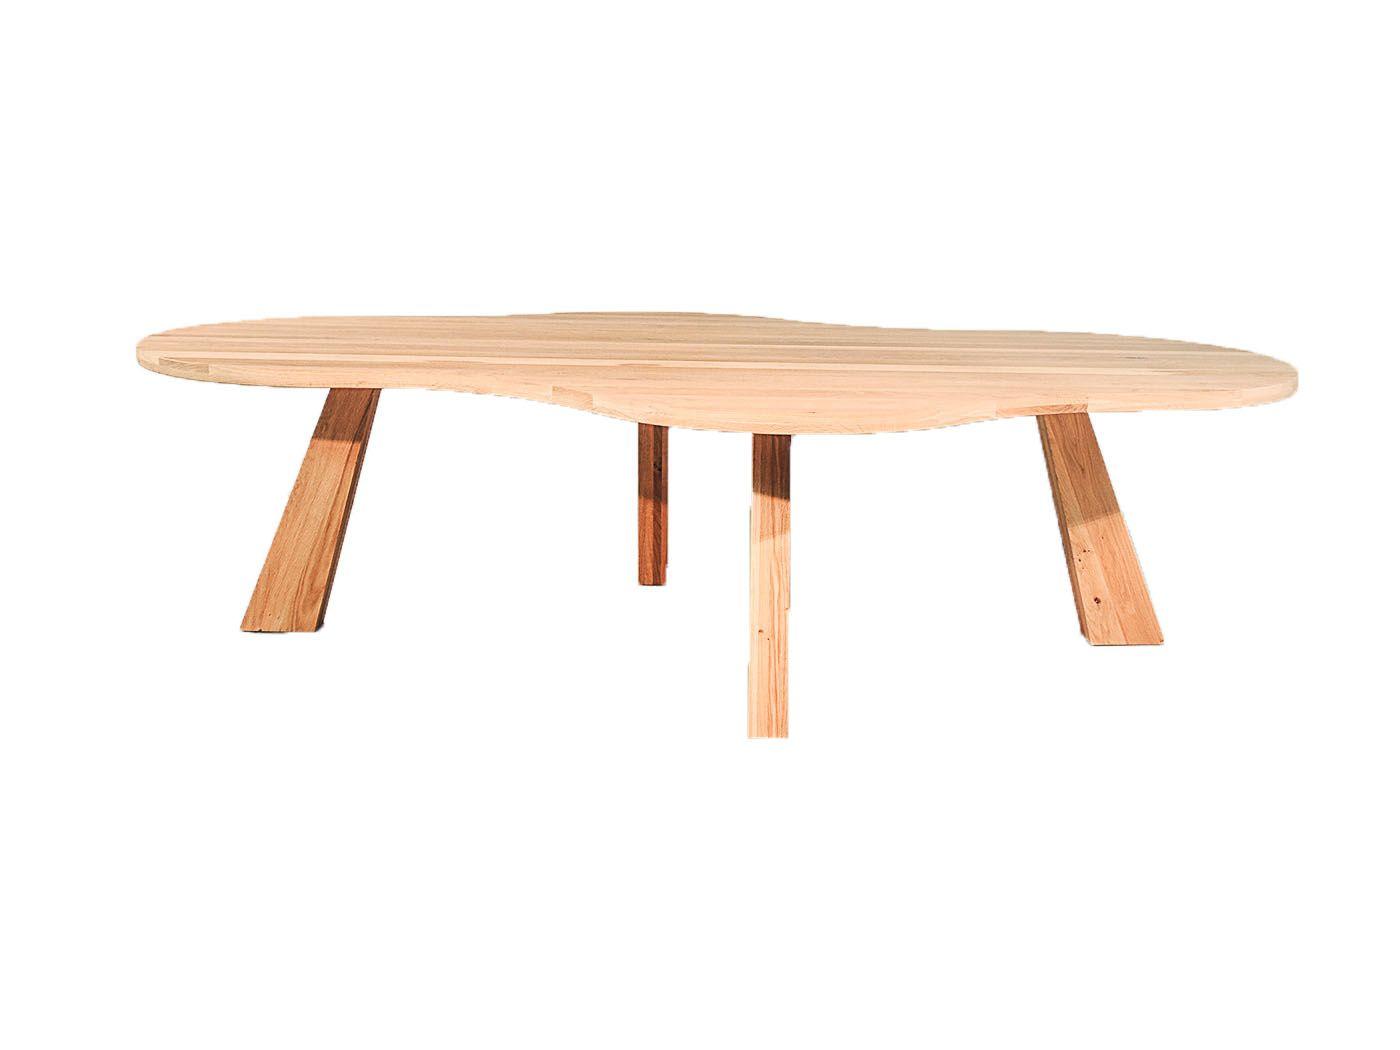 Ronde Tafel 8 Personen.Paris Eettafel 8 Personen Ronde Eettafel Table Furniture En